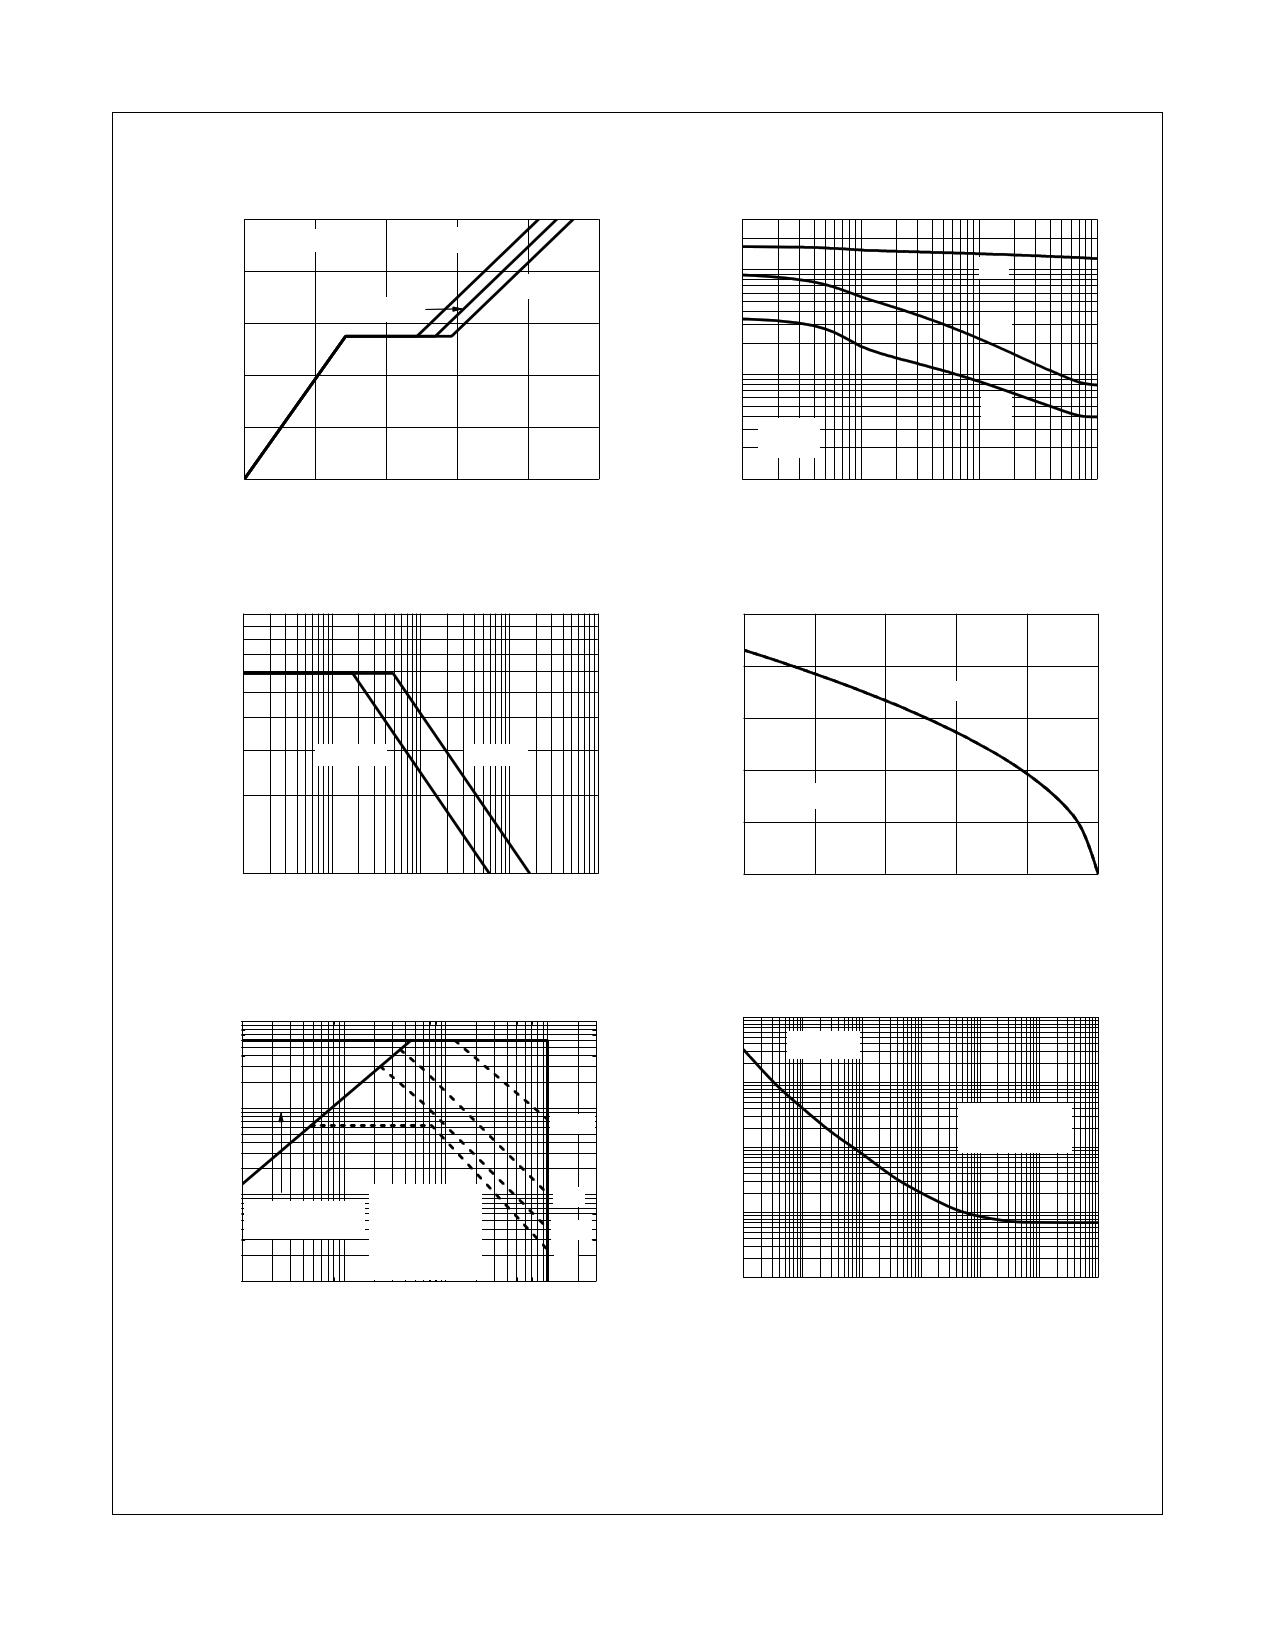 FDD3860 pdf, 반도체, 판매, 대치품